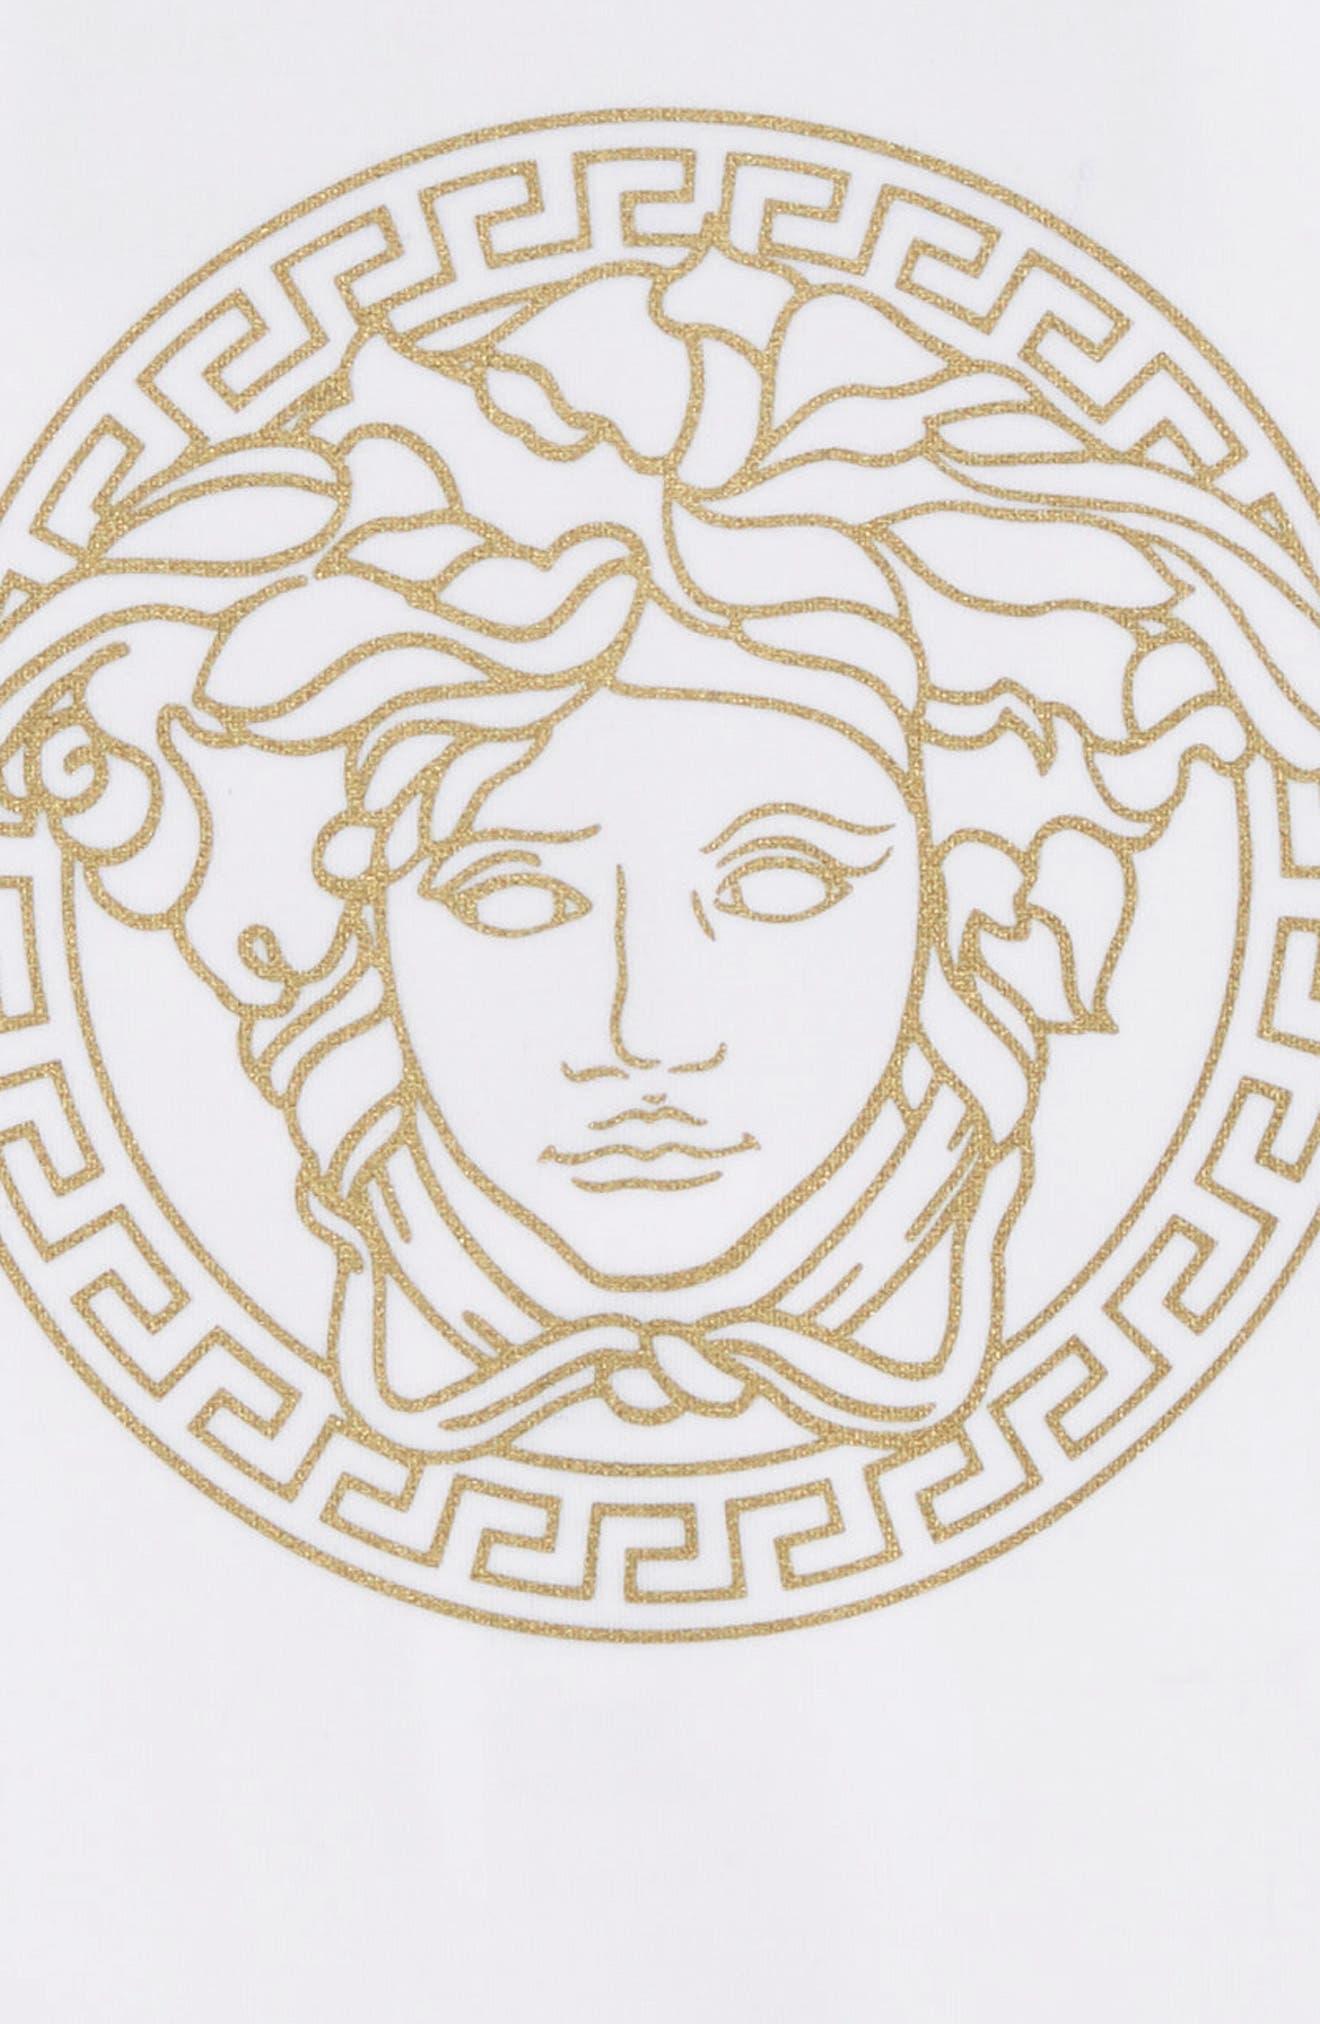 VERSACE, Medusa One-Piece Swimsuit, Alternate thumbnail 3, color, 4915 WHITE GOLD